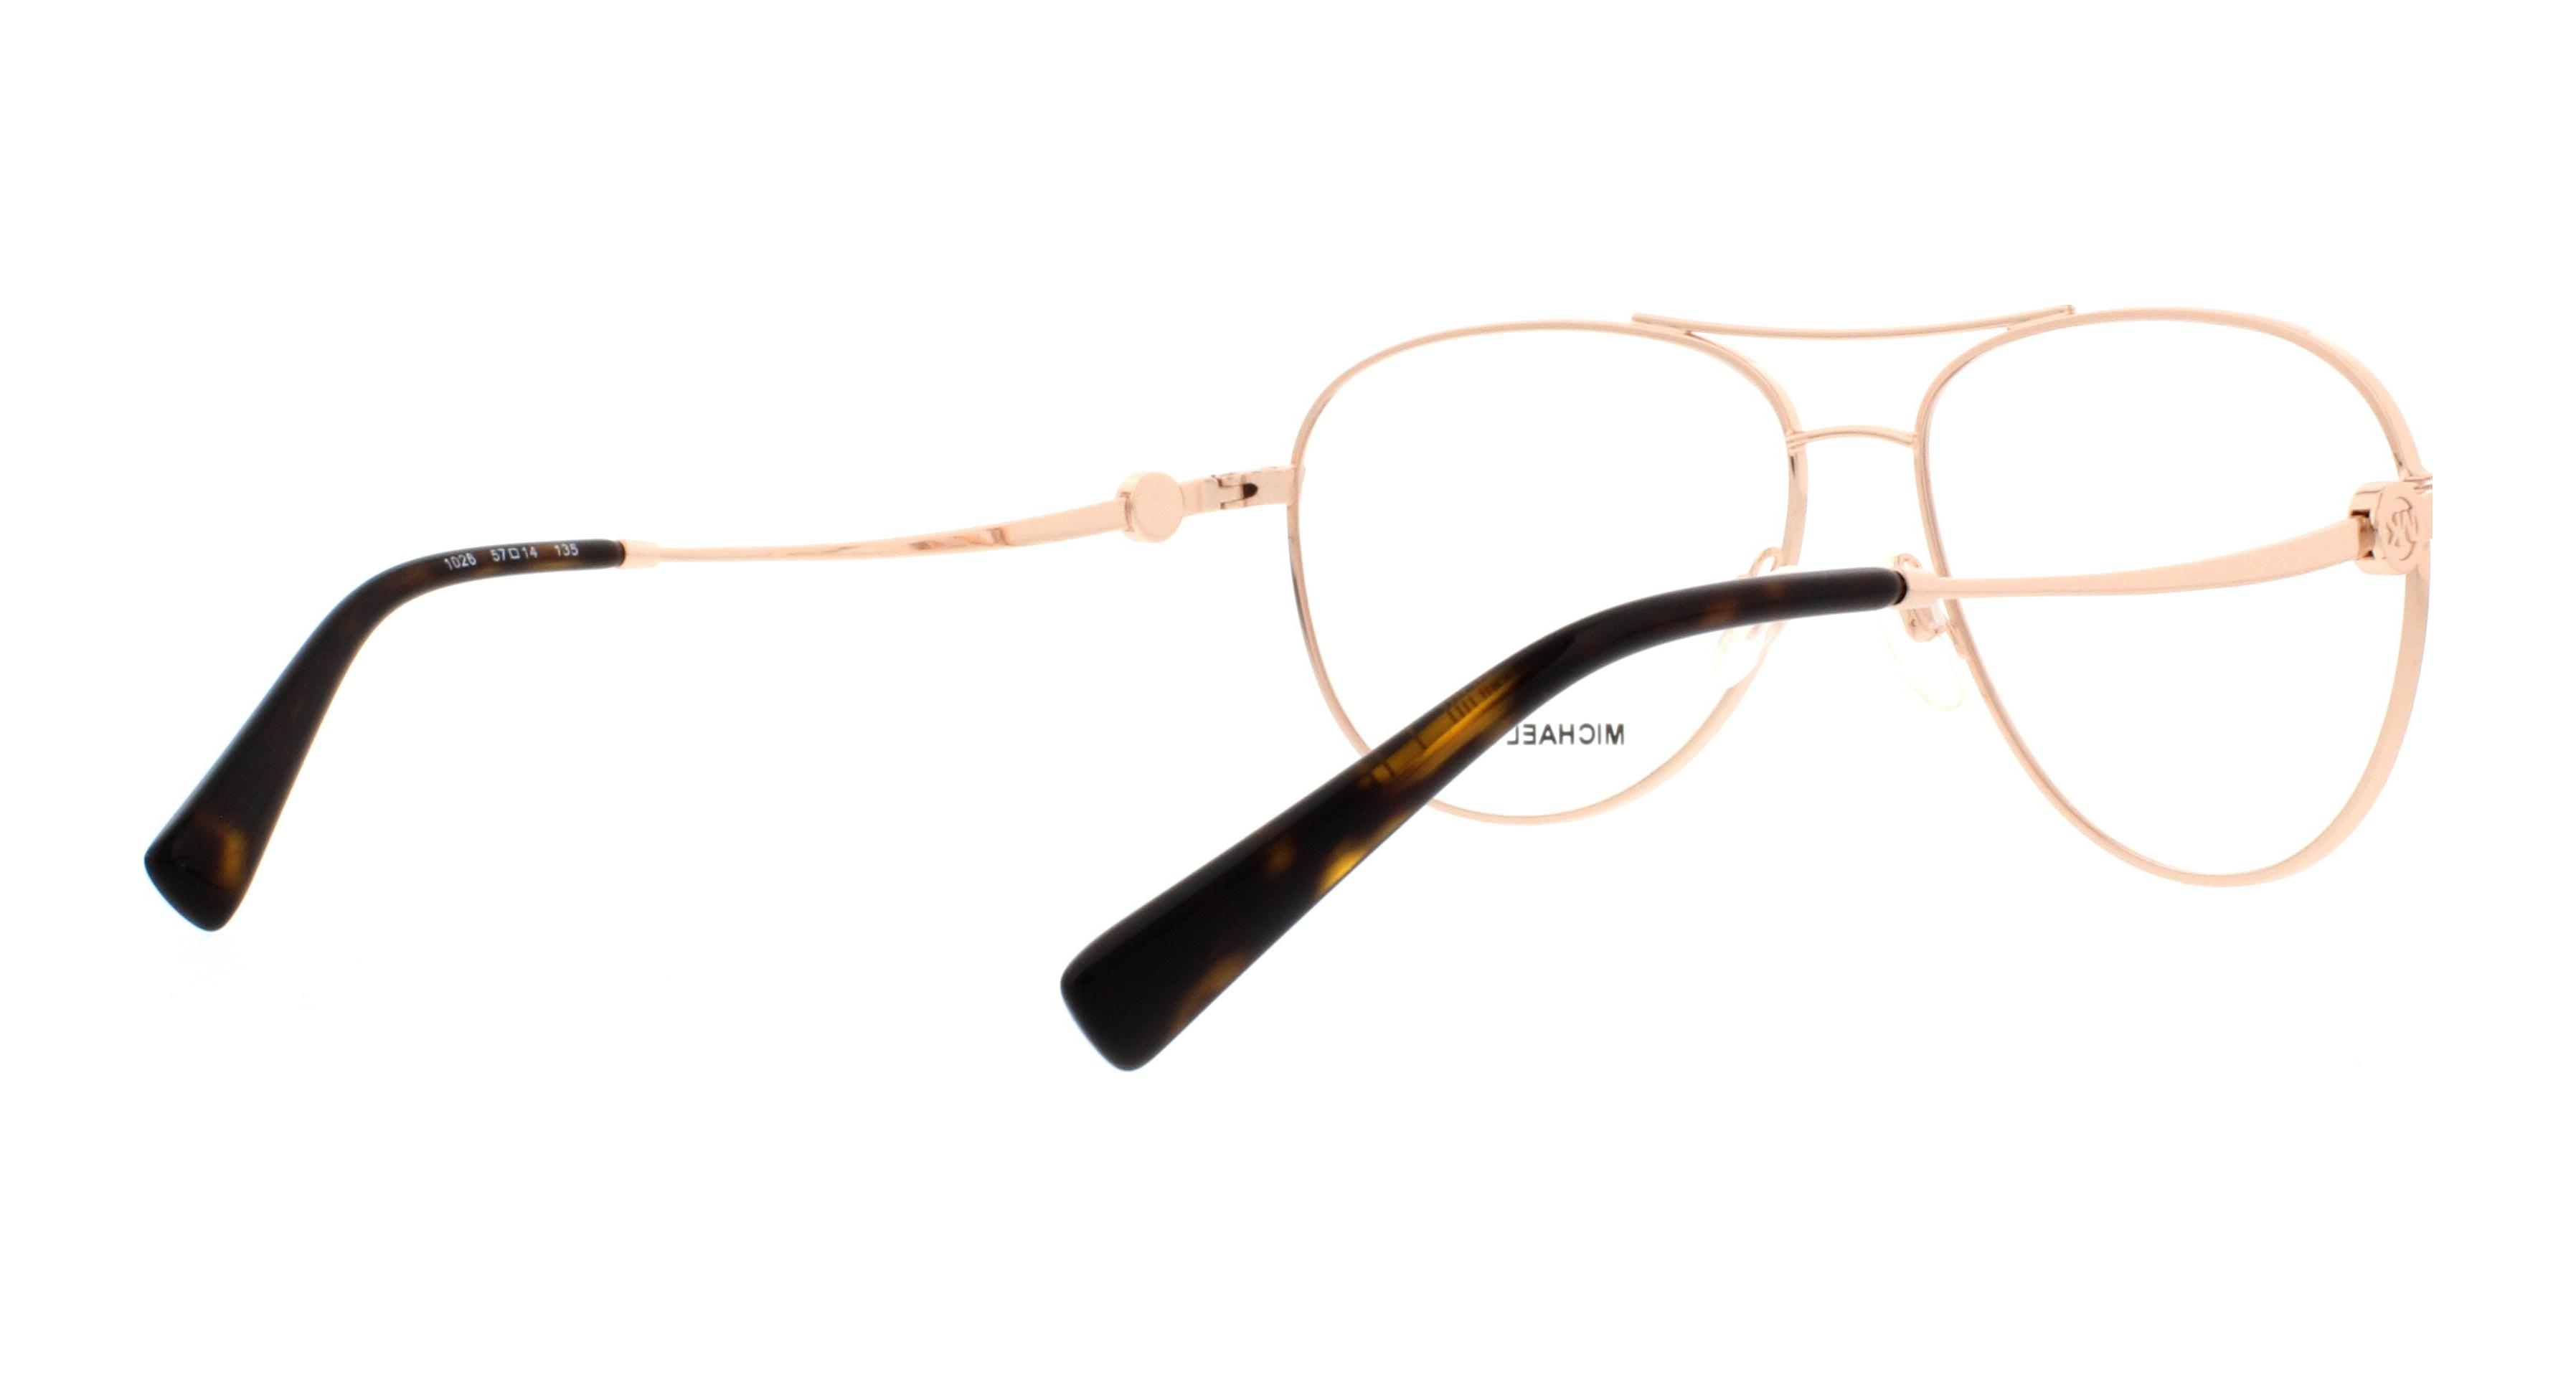 MICHAEL KORS Eyeglasses MK 7009 1026 Rose Gold 57MM - Walmart.com